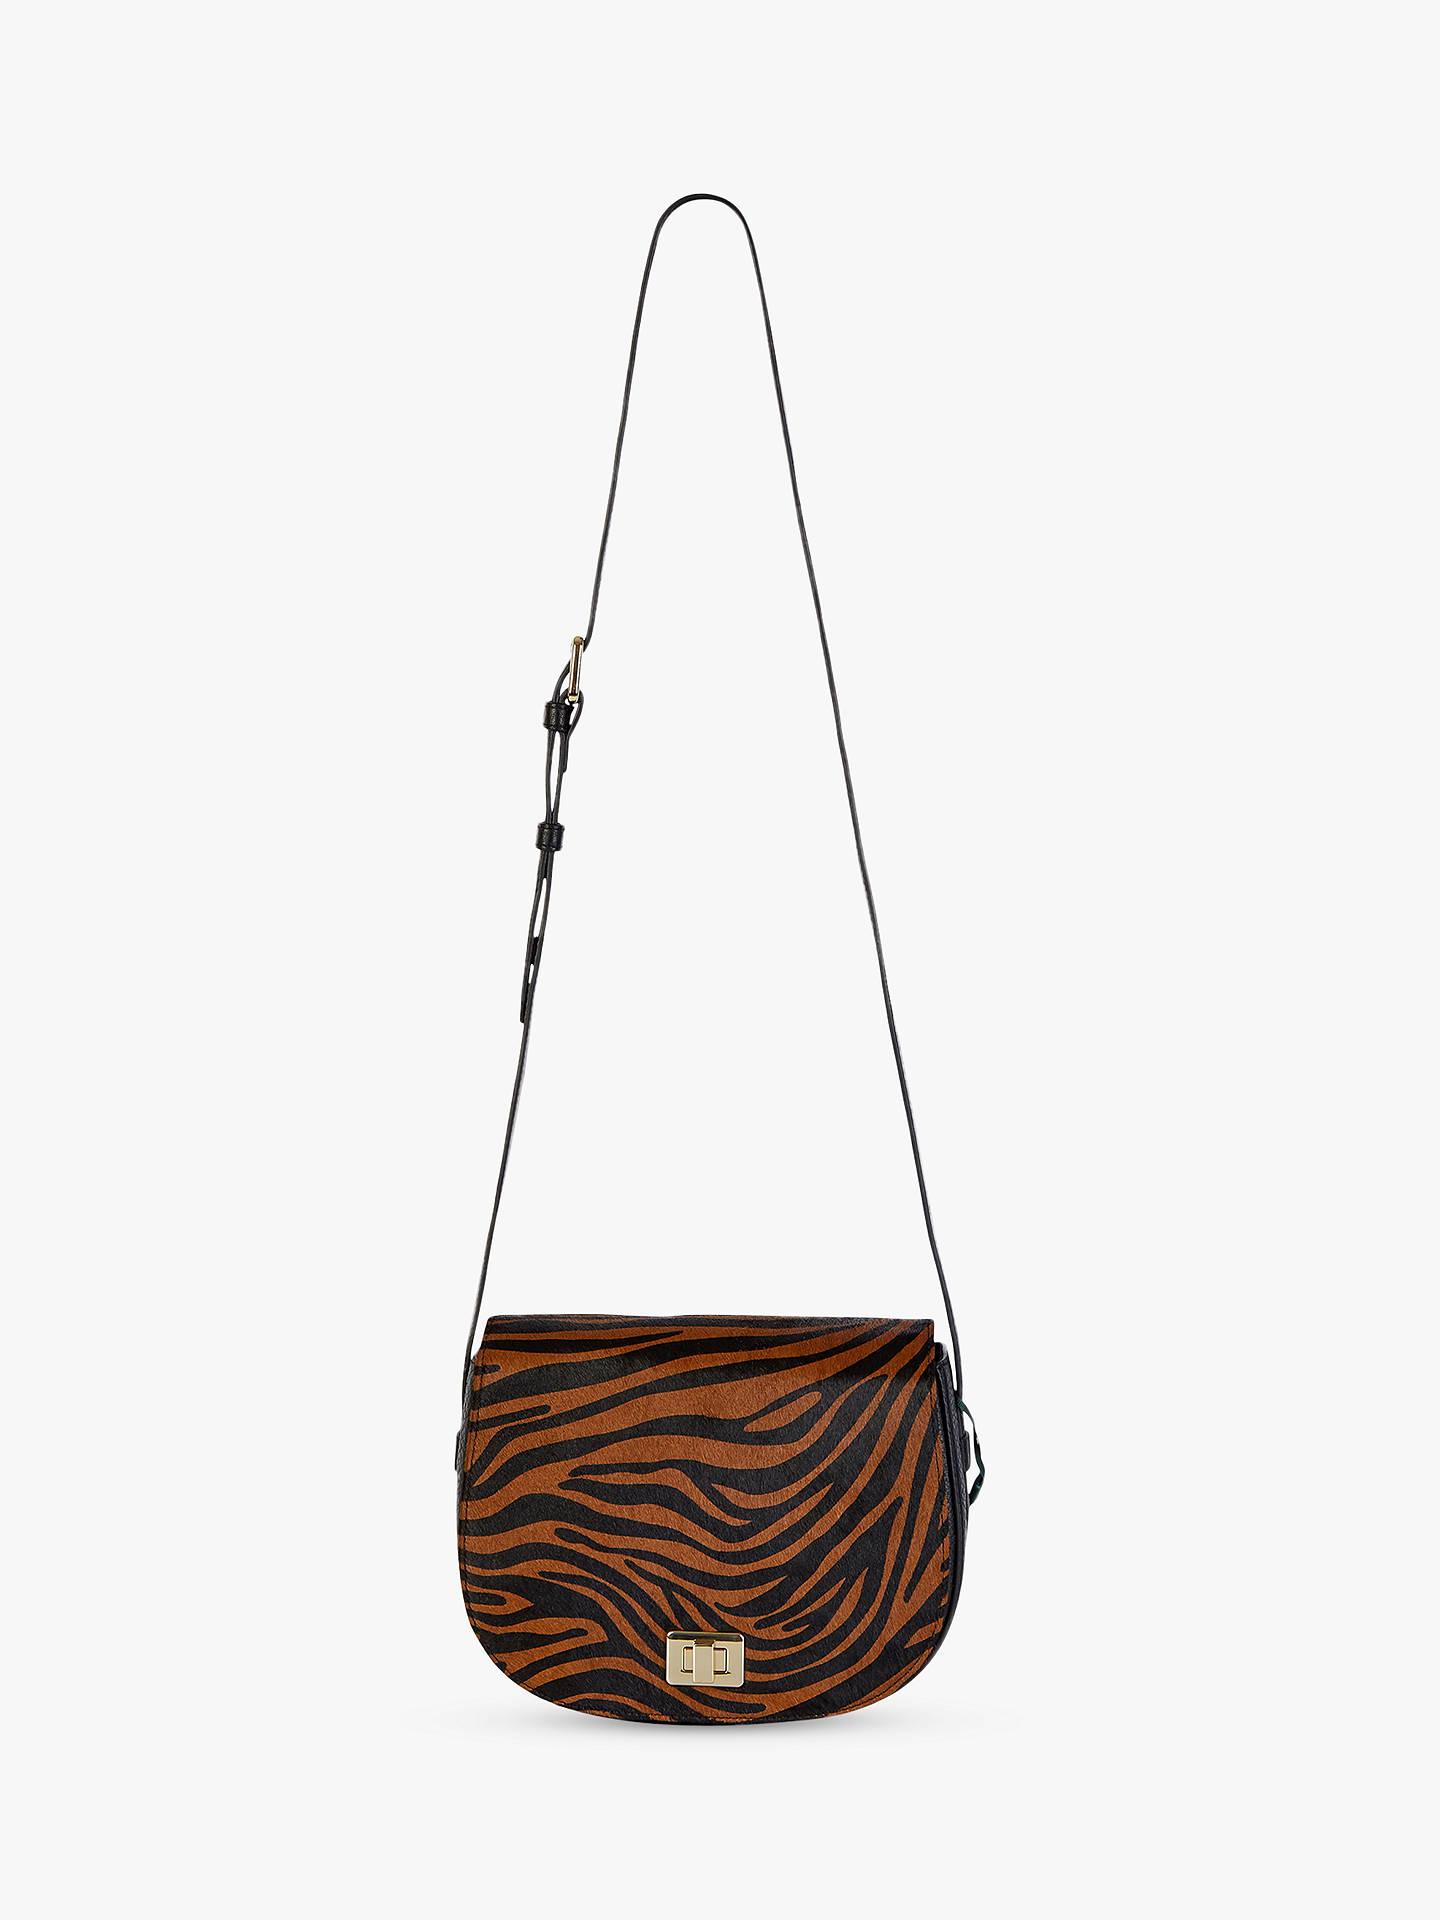 Hobbs Oxford Leather Zebra Print Saddle Bag, Brown at John ...